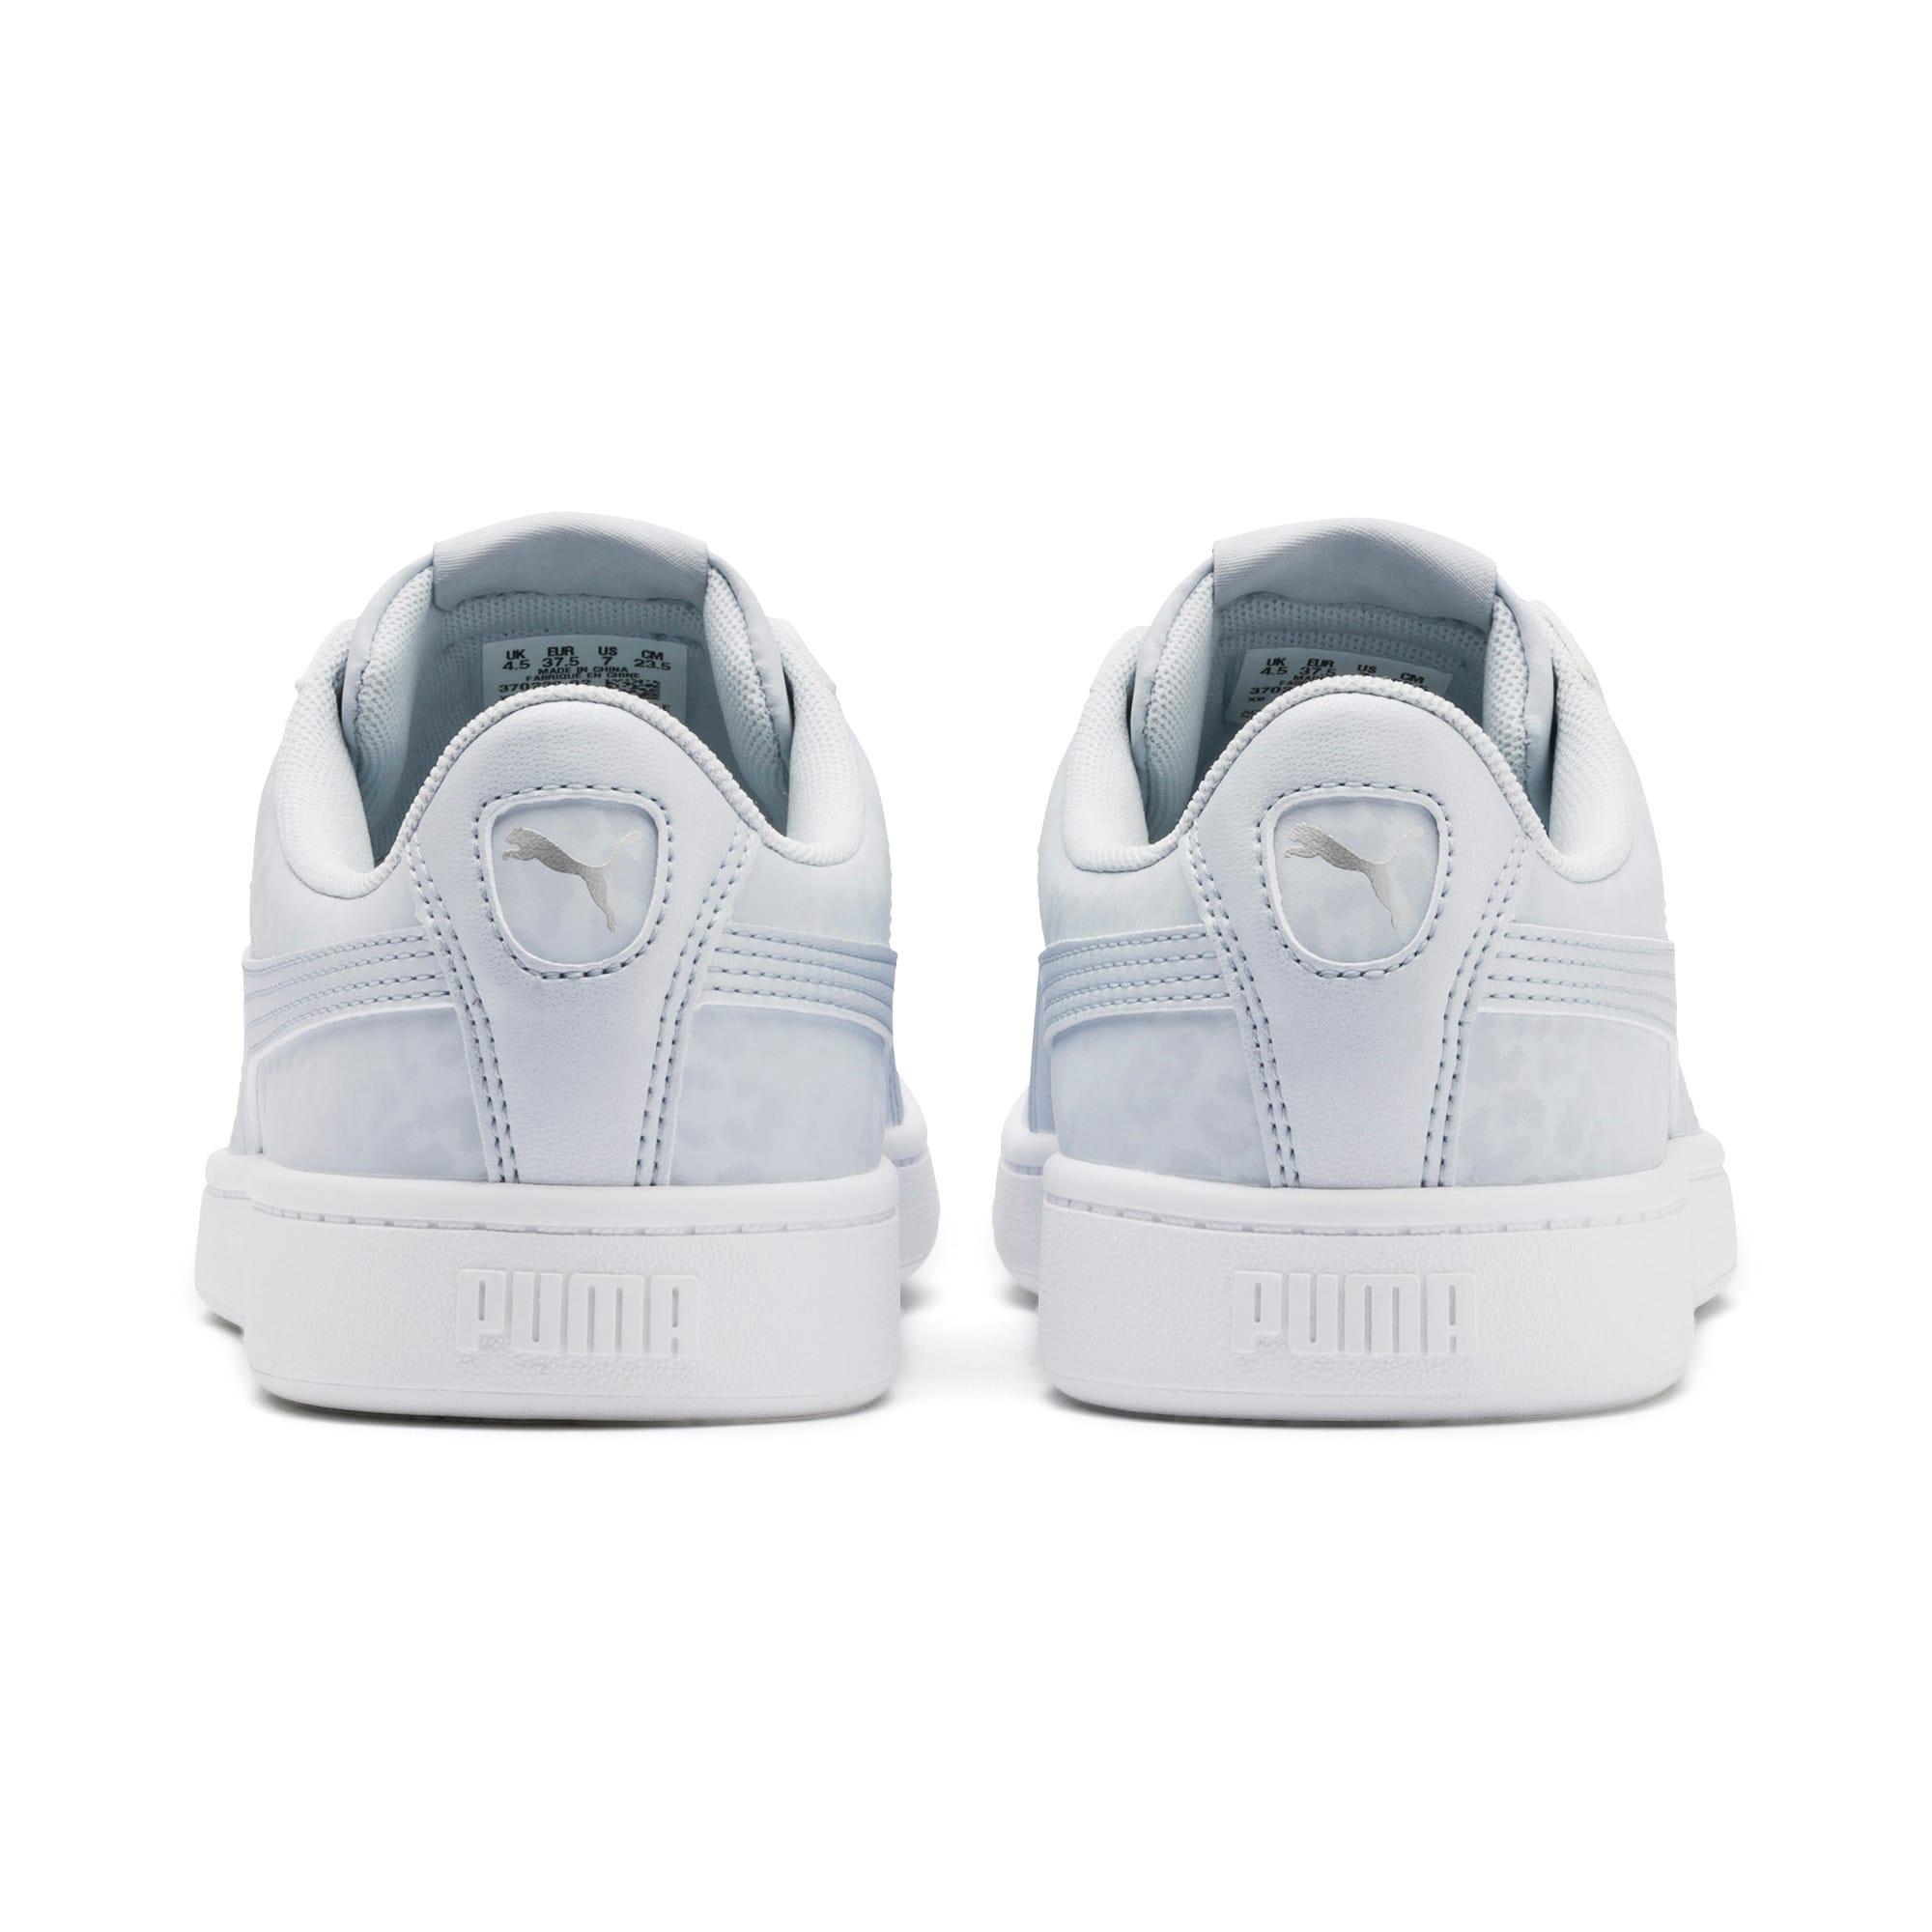 Thumbnail 4 of PUMA Vikky v2 Wildcat Women's Sneakers, Heather-Puma Silver-White, medium